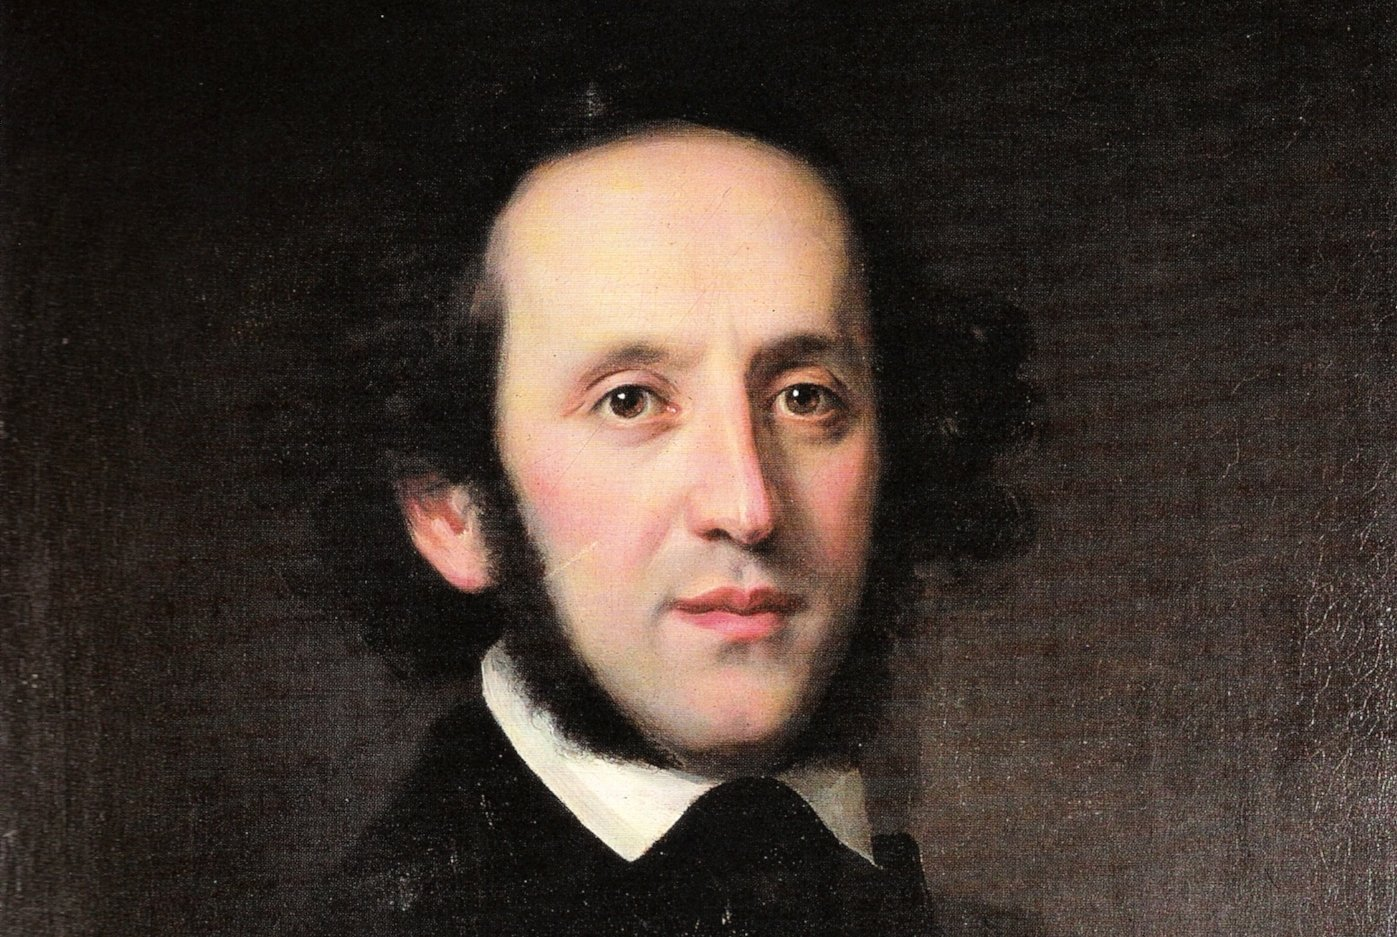 Felix Mendelssohn Bartholdy, Gemälde von Eduard Magnus, 1846 (public domain)